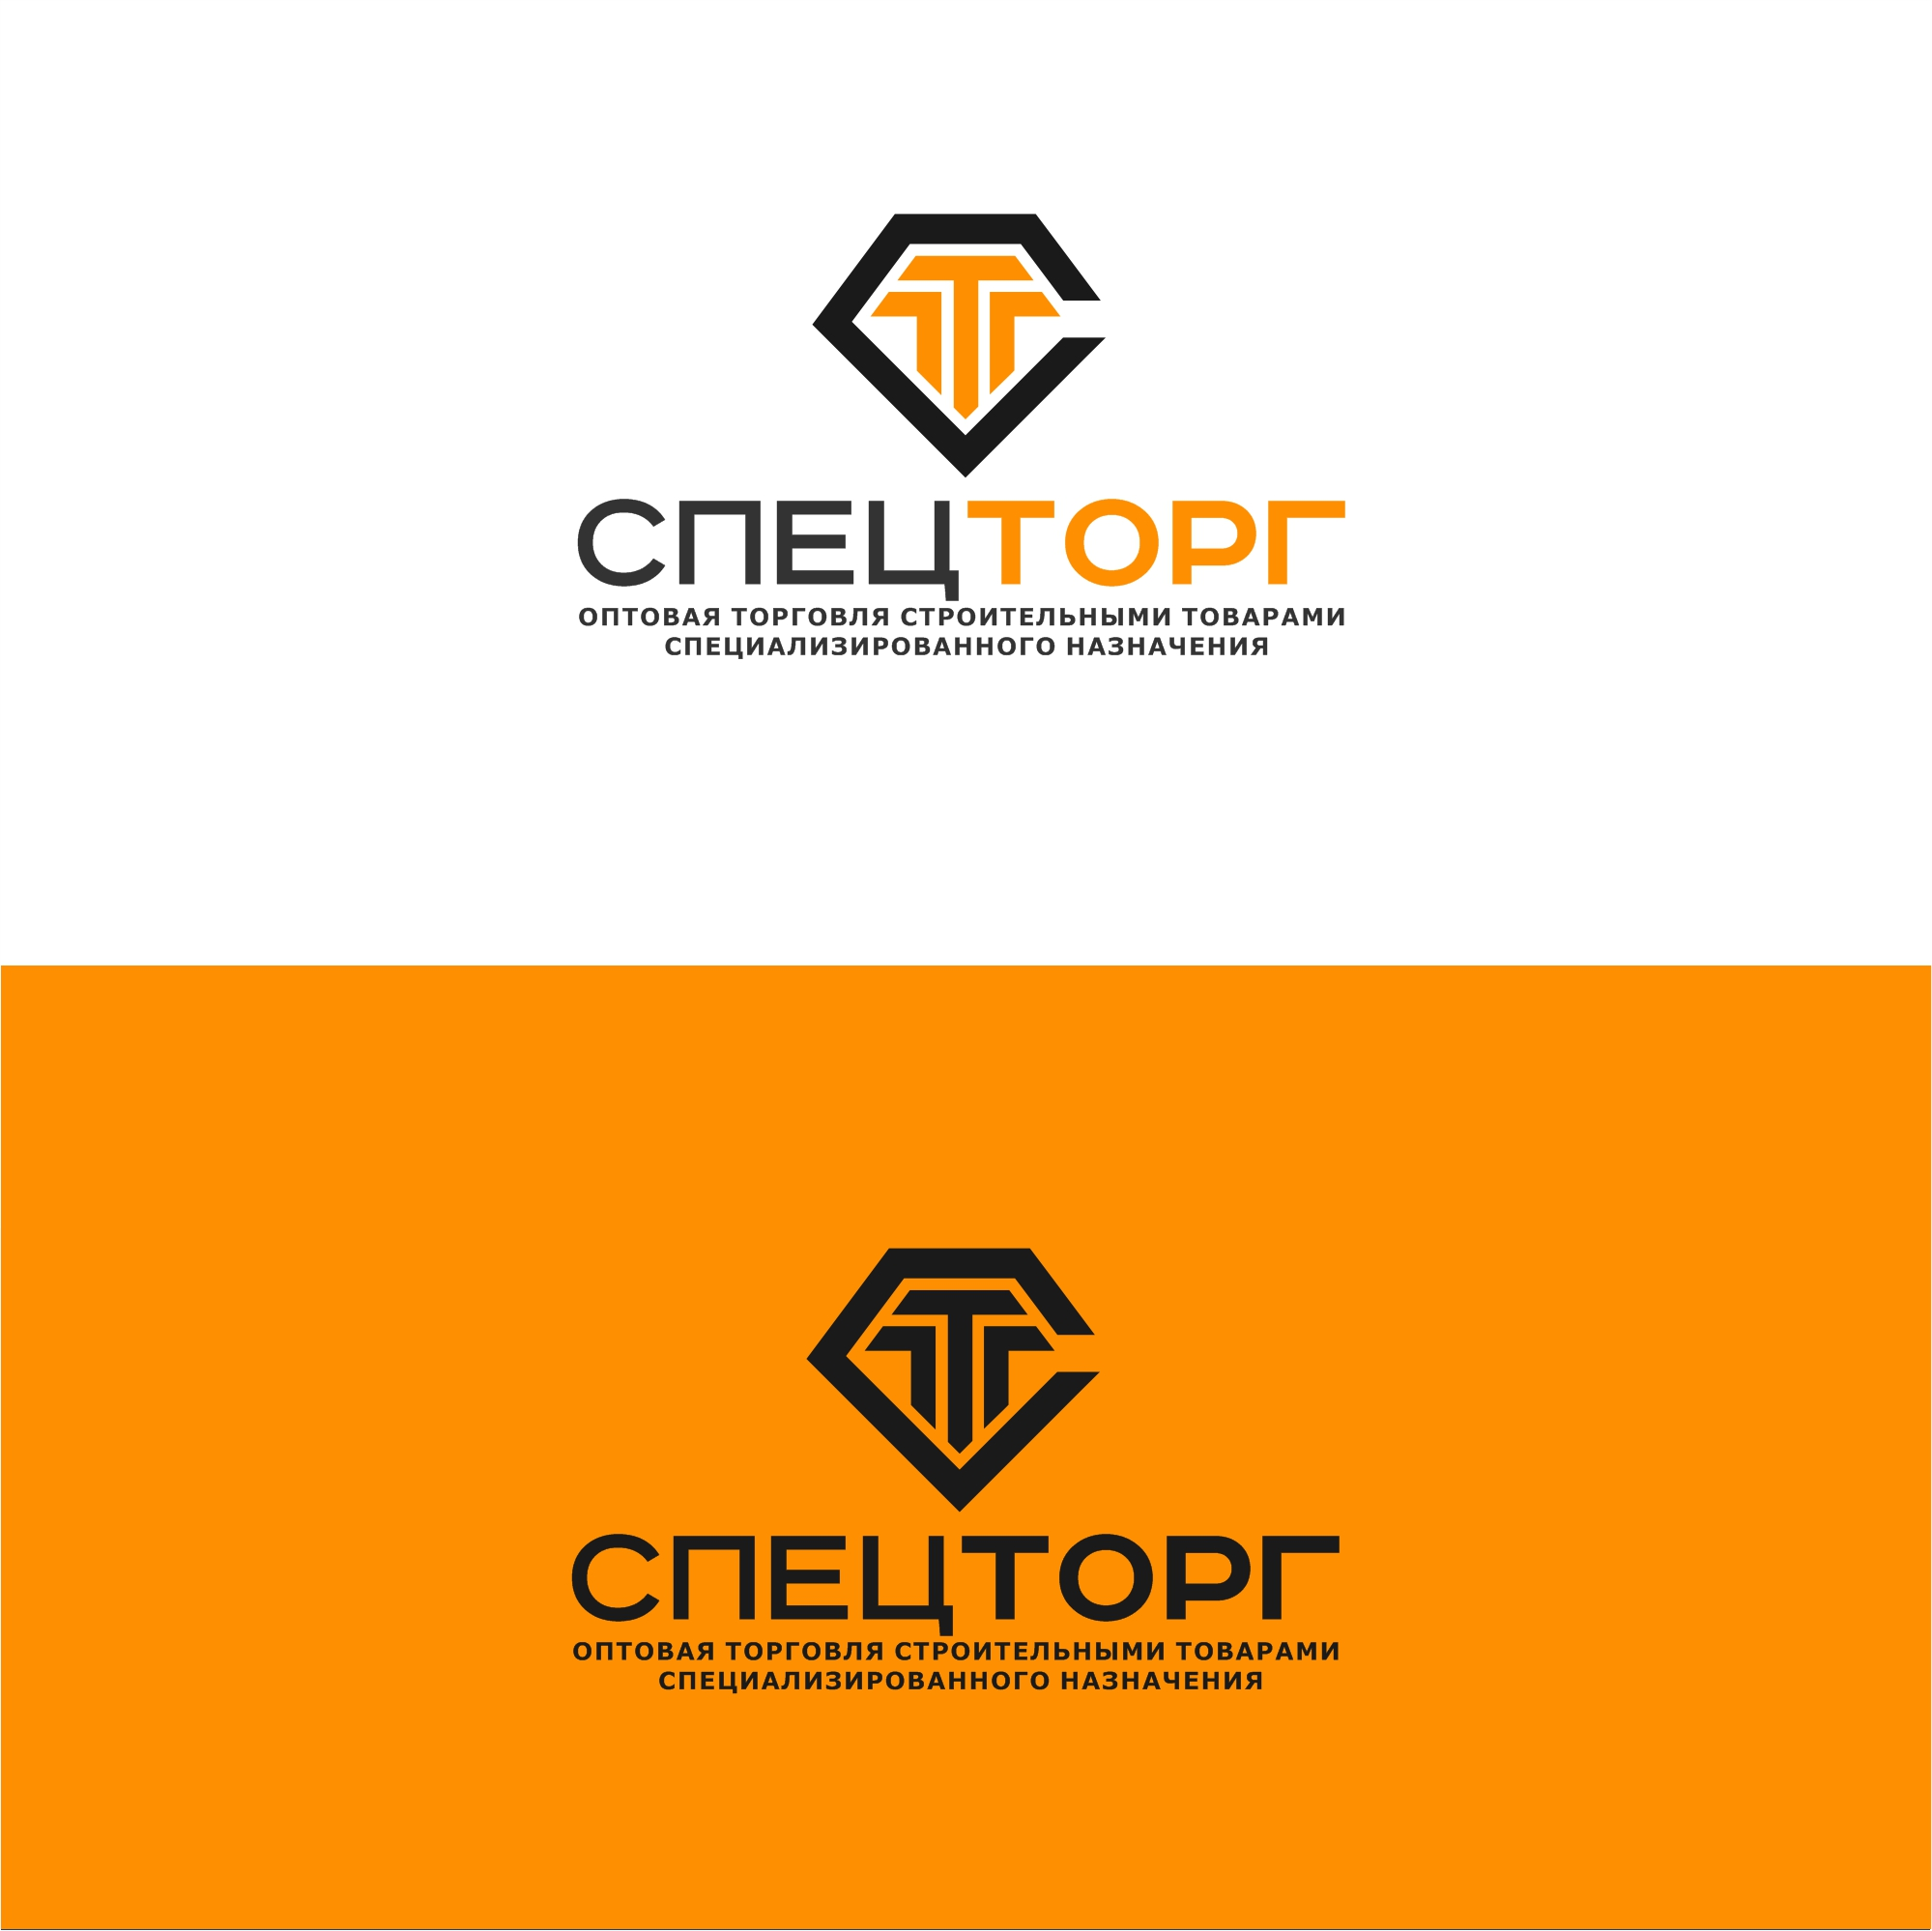 Разработать дизайн  логотипа компании фото f_6495dd27cb39420d.jpg